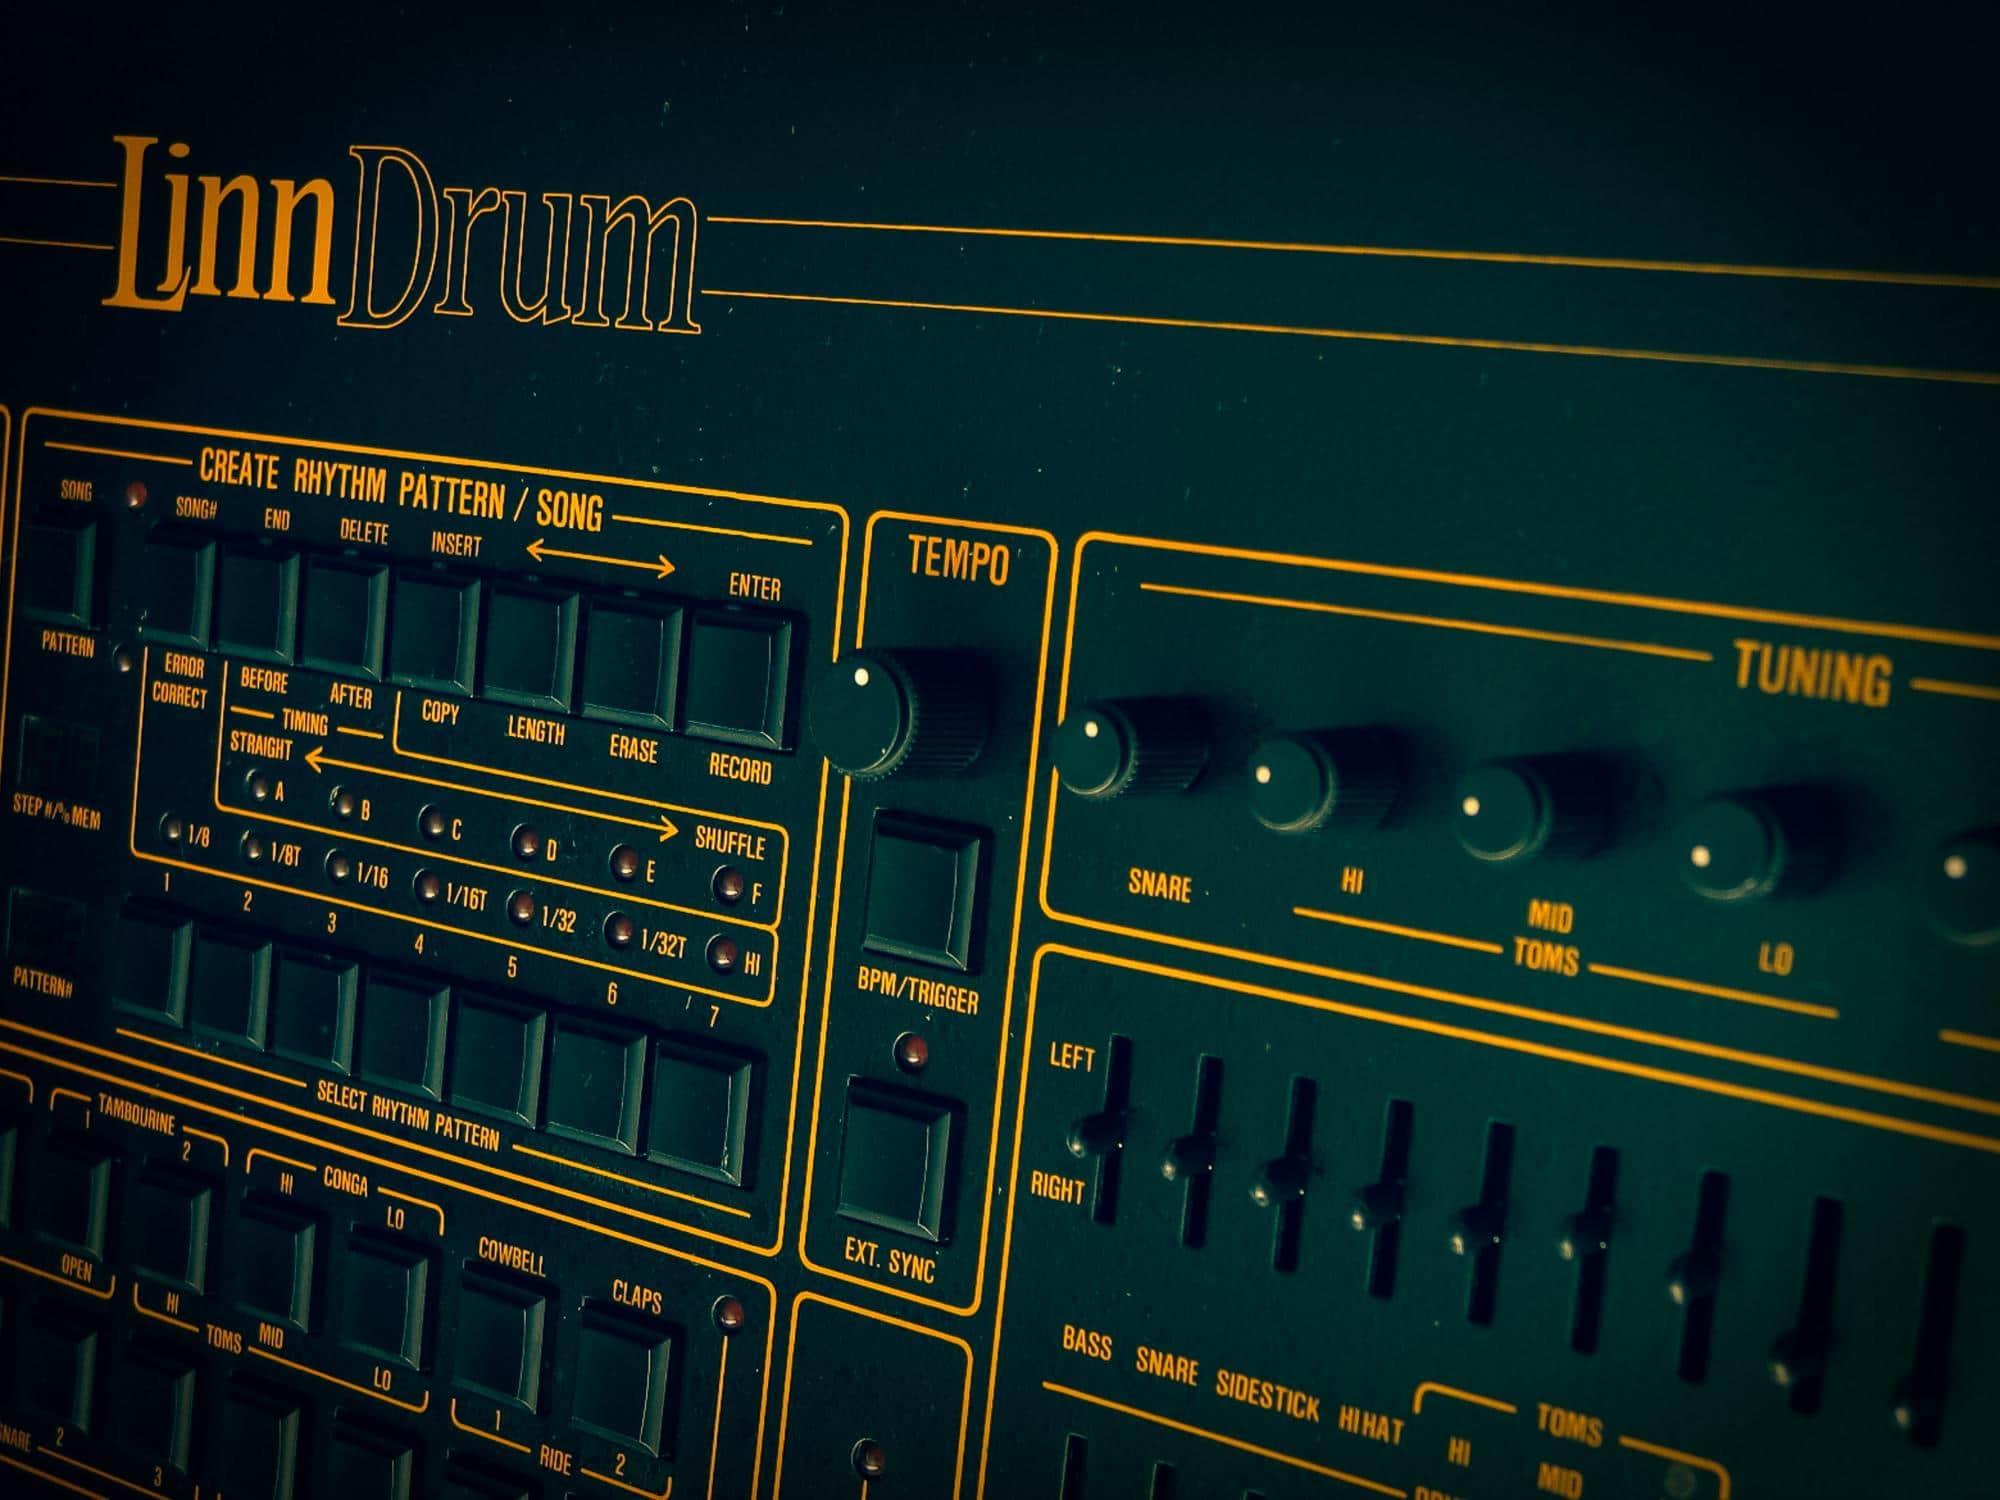 Linn Drum by Steve Harvey